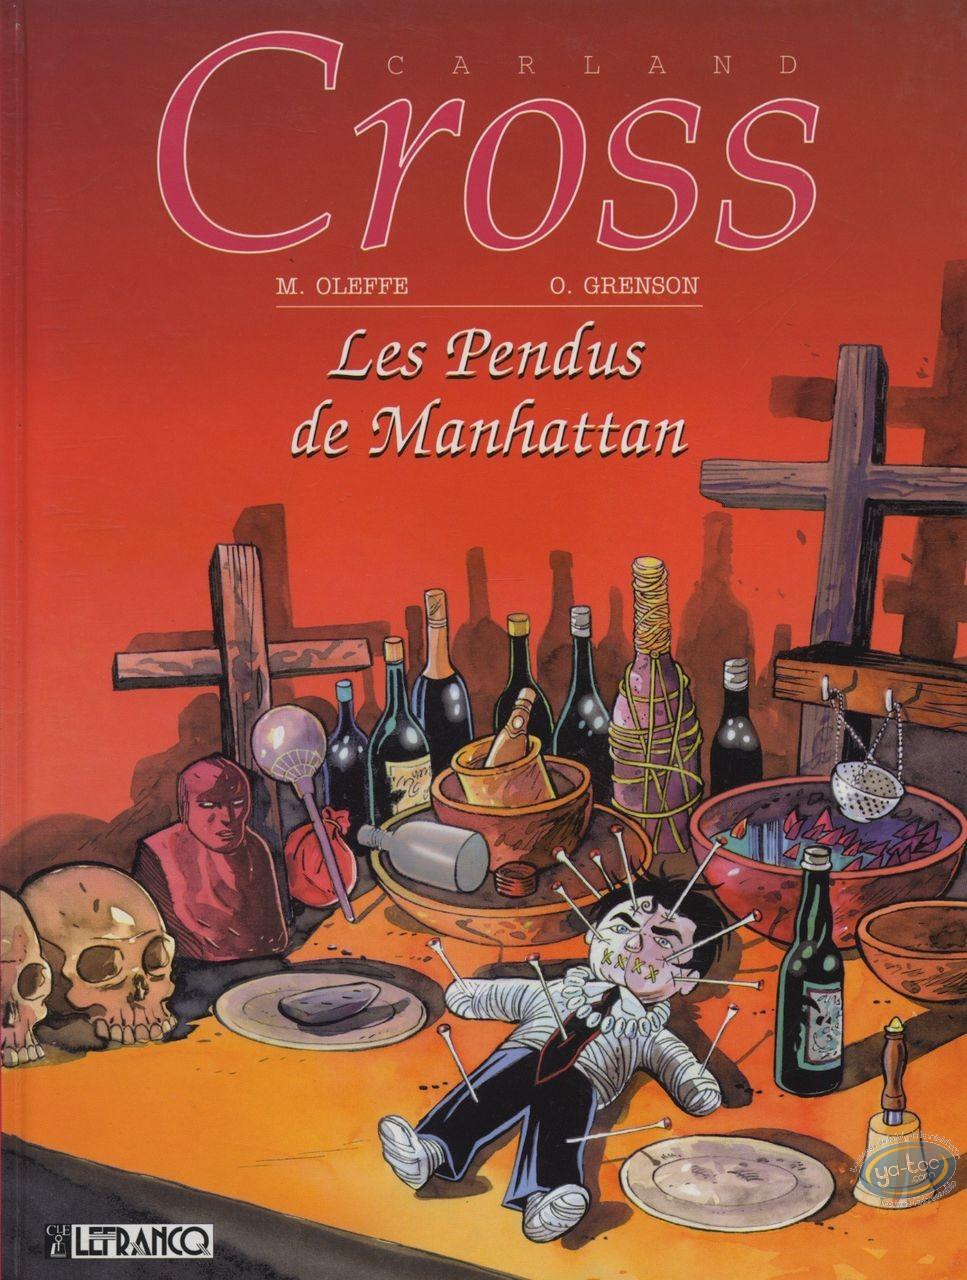 Used European Comic Books, Carland Cross : Les Pendus de Manhattan